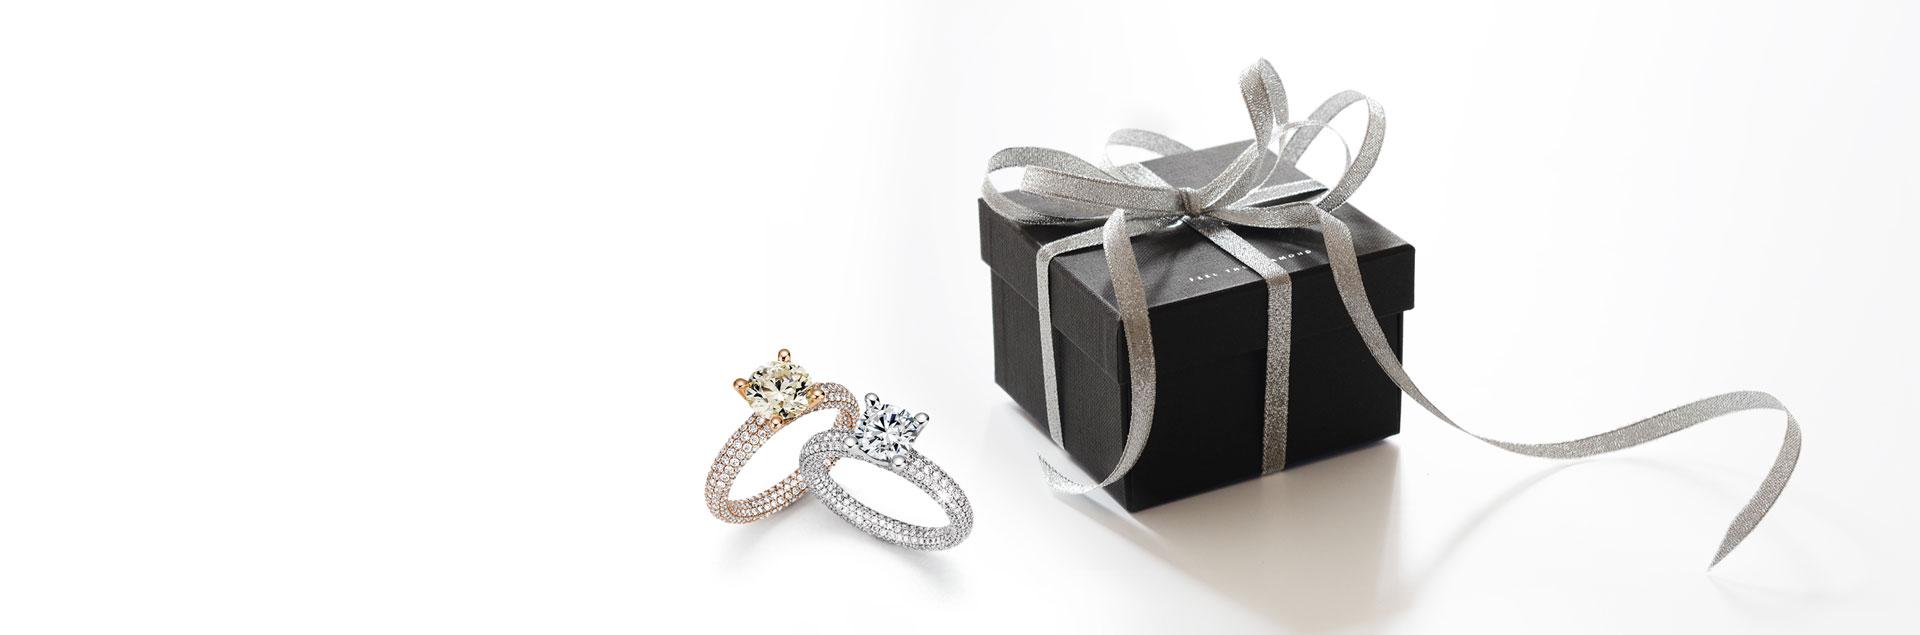 181129_noor-by-wurster-diamonds_Eternity-Ringe-1